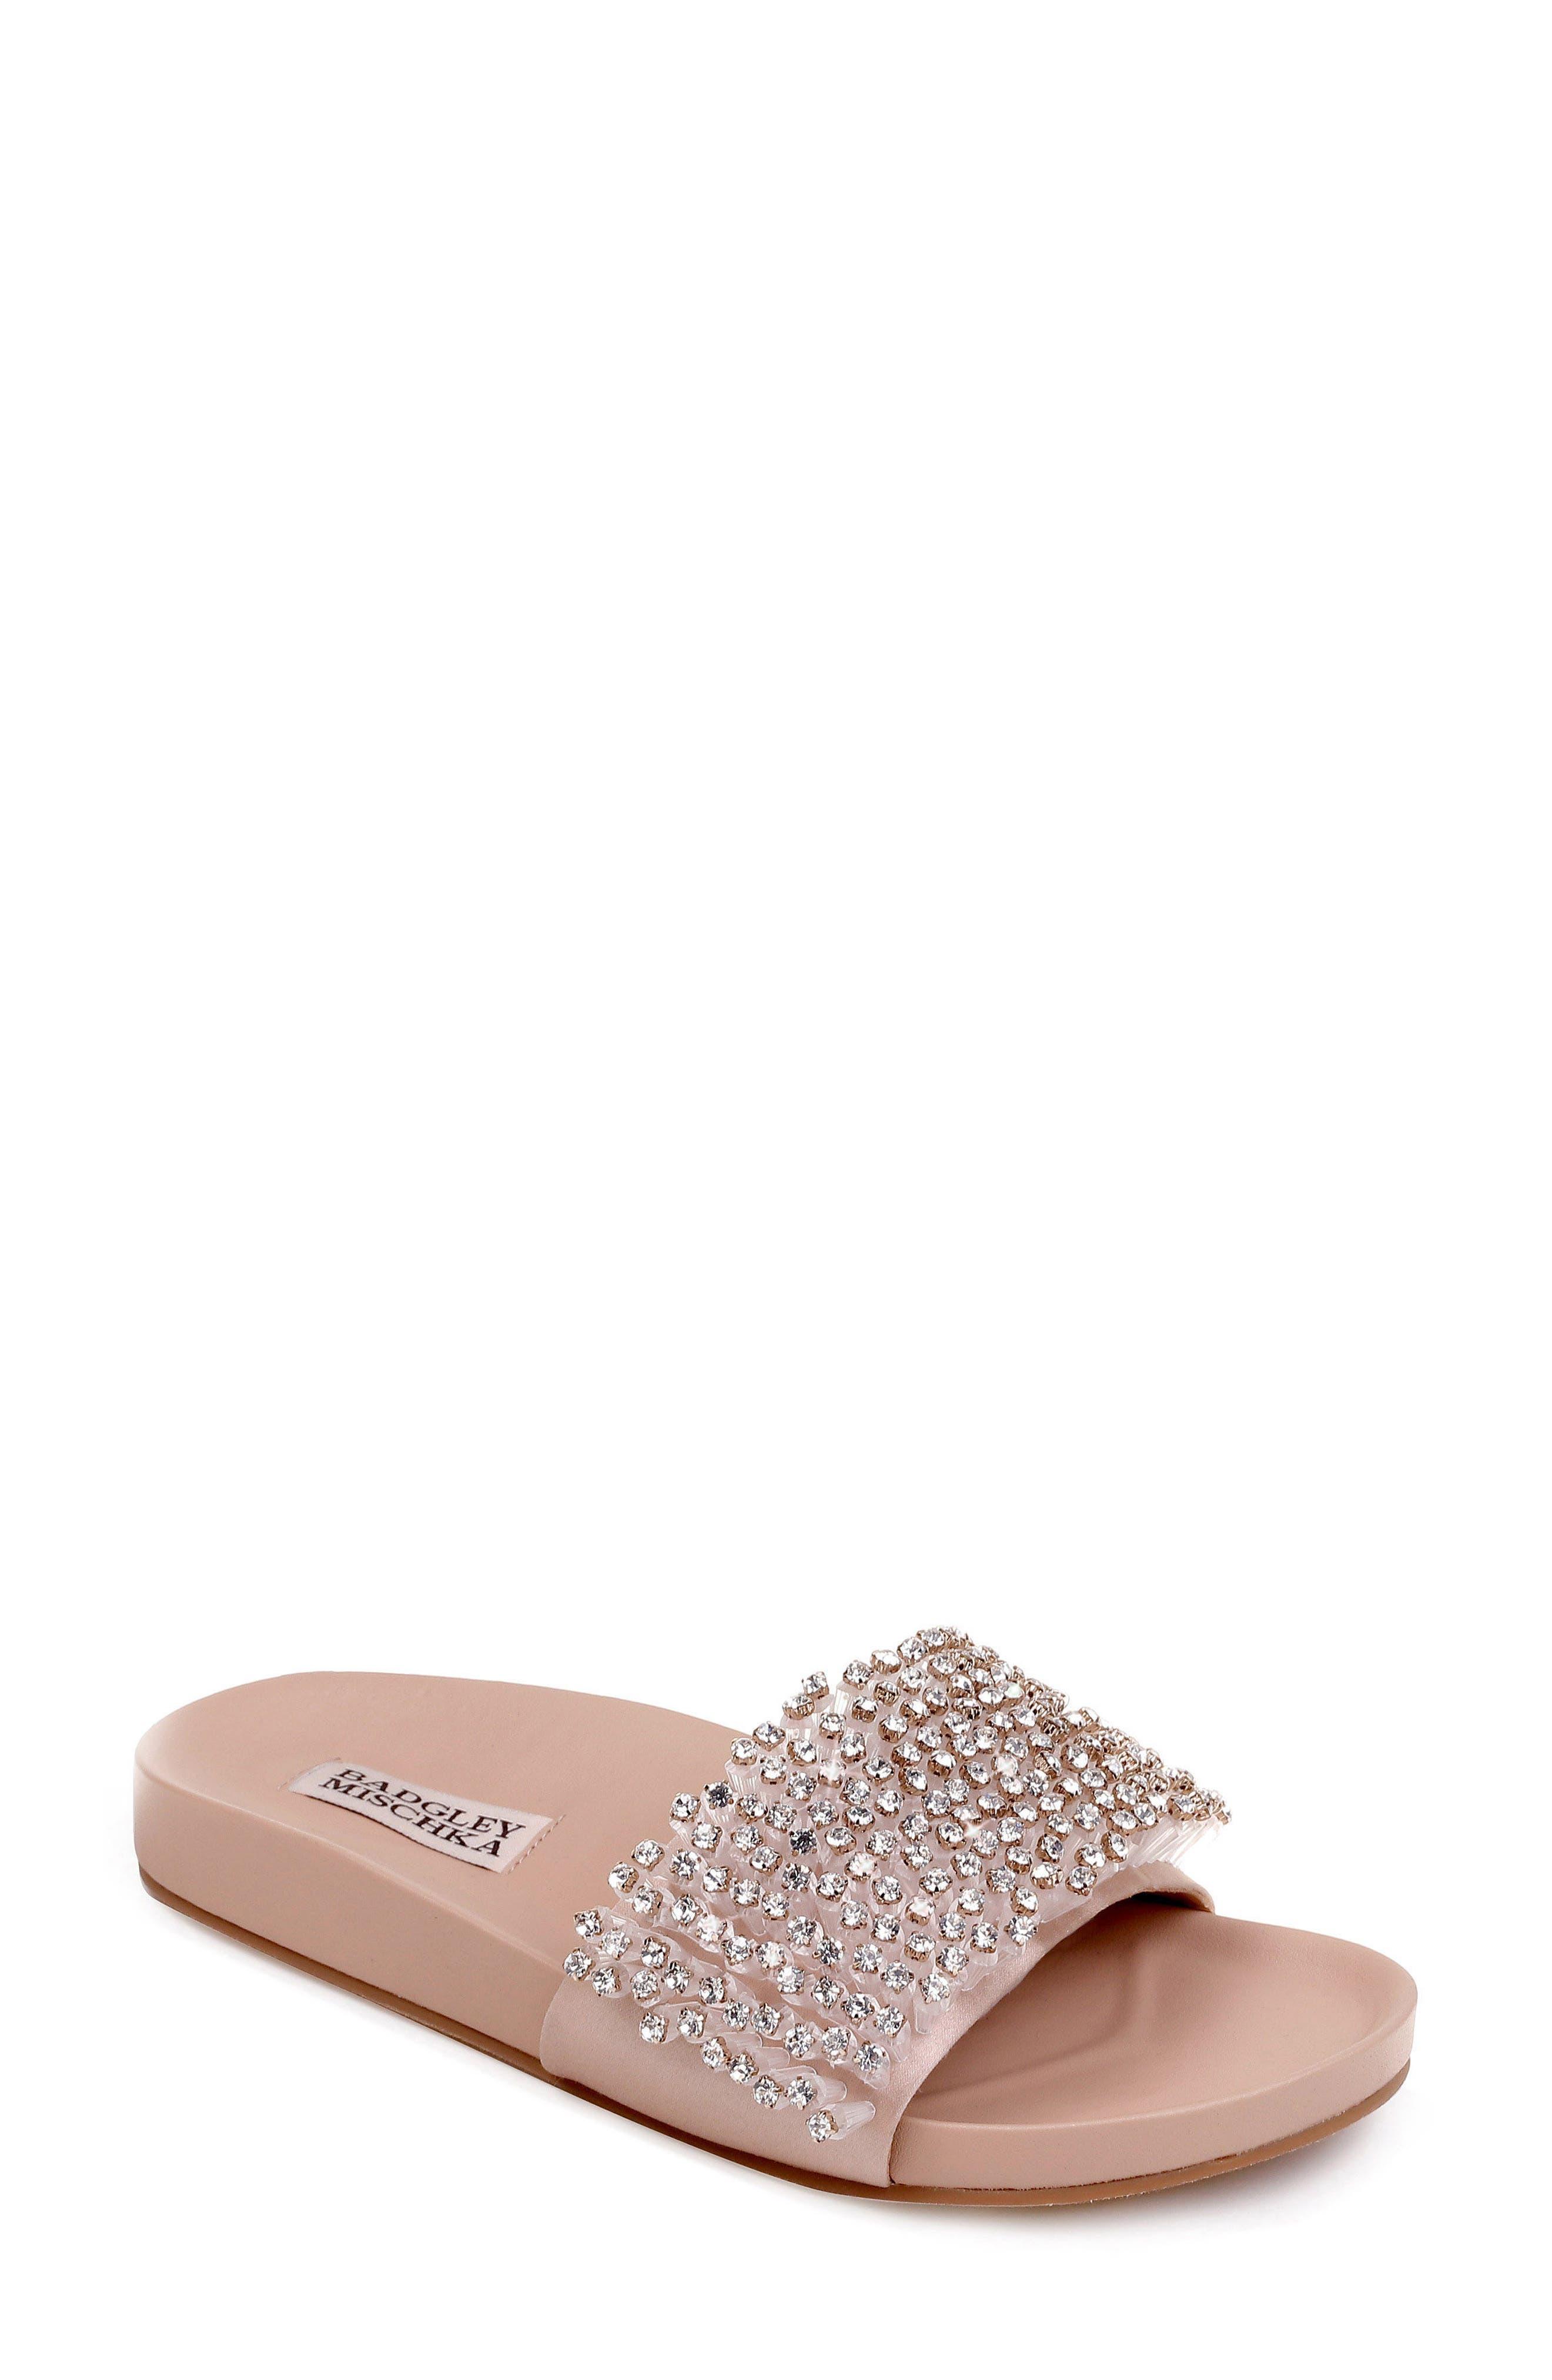 Horton Crystal Embellished Sandal,                             Main thumbnail 2, color,